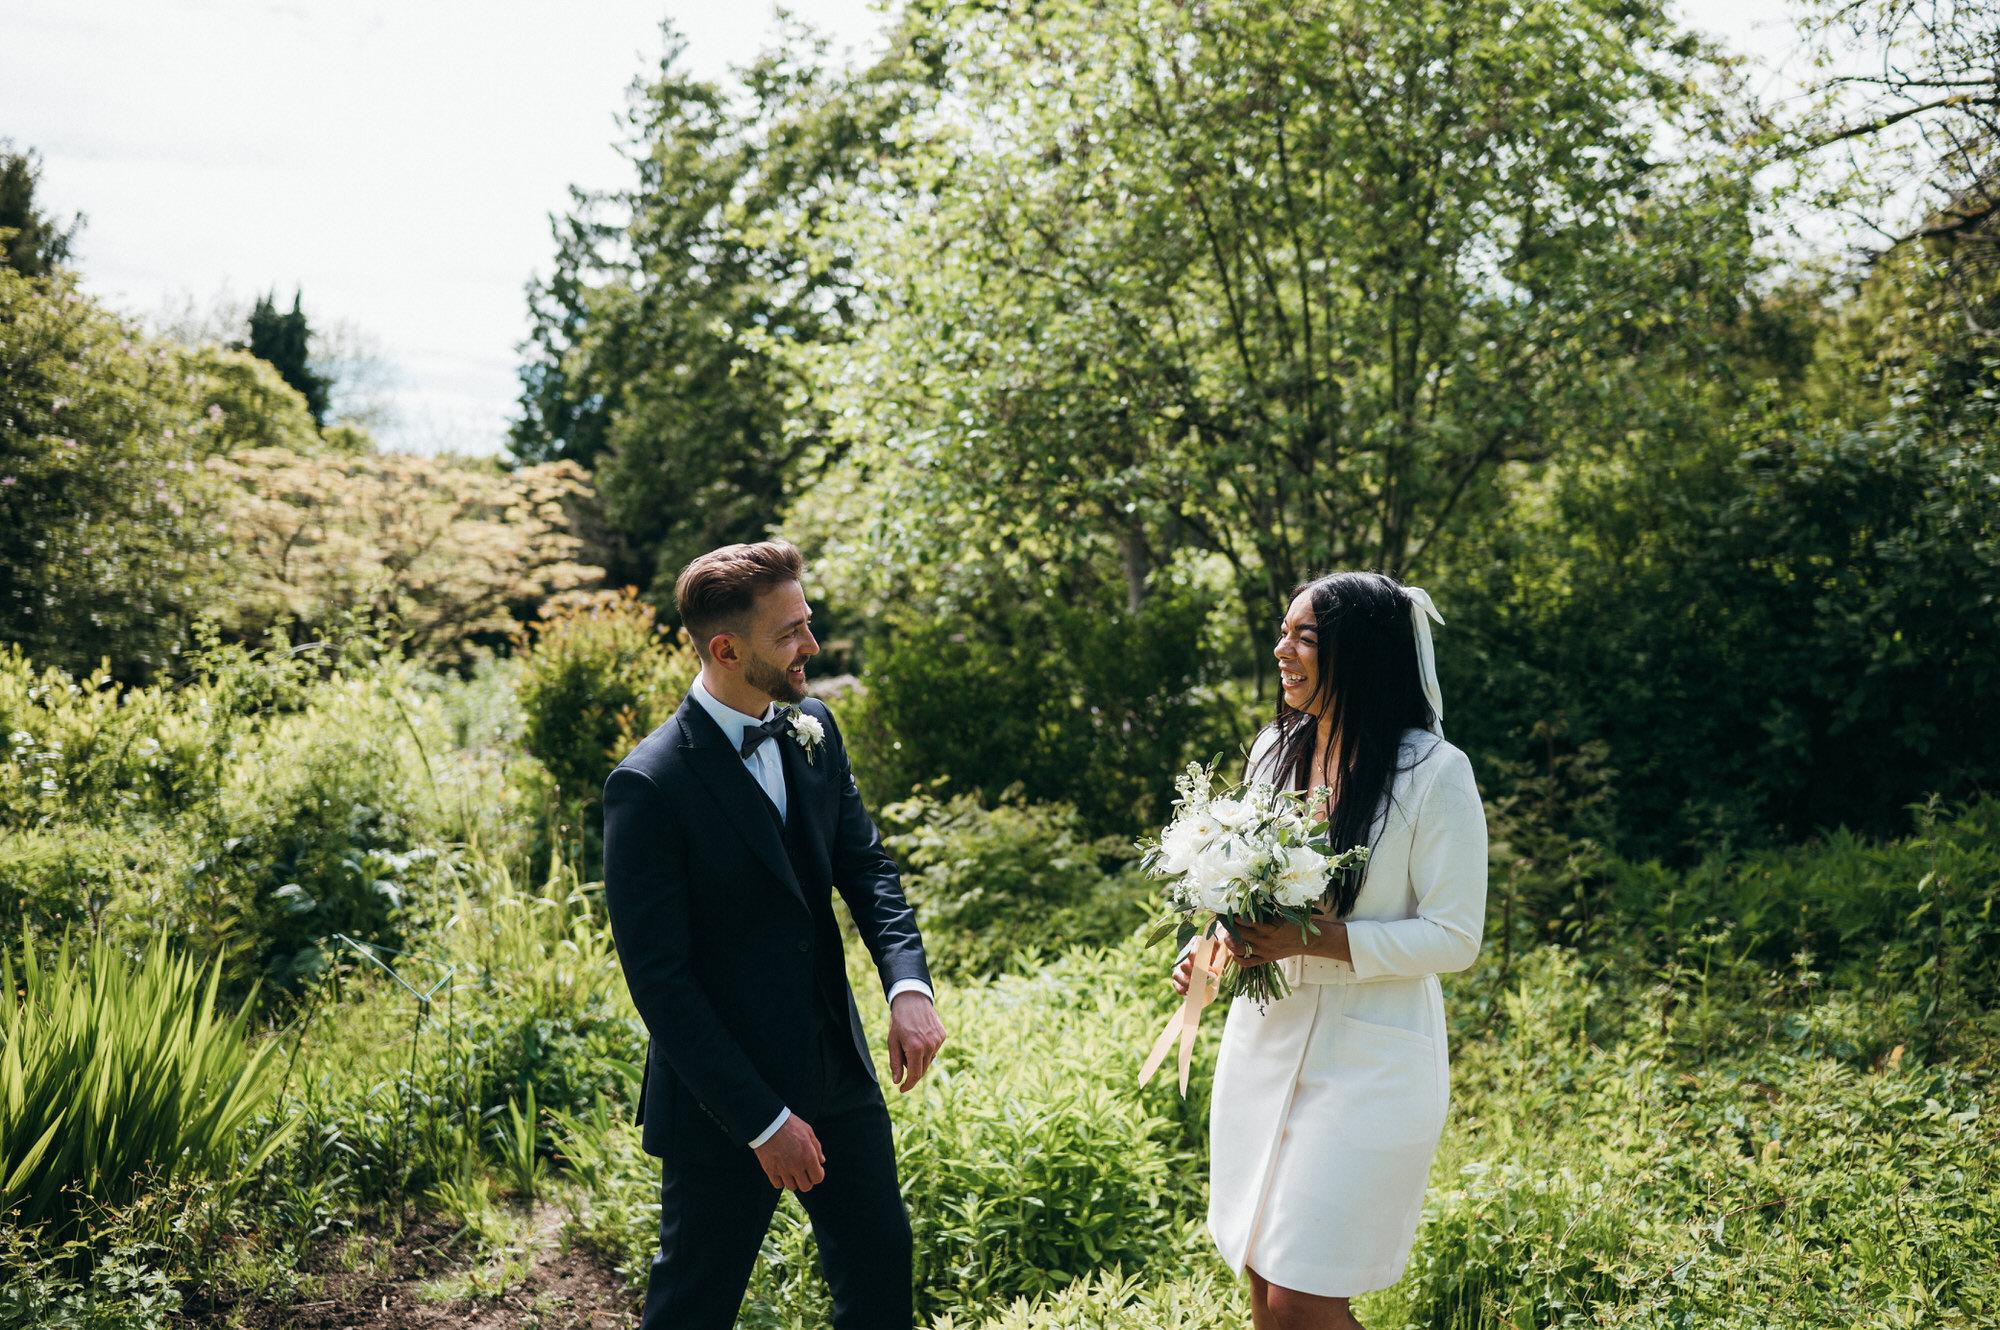 Intimate wedding botanical gardens bath 31